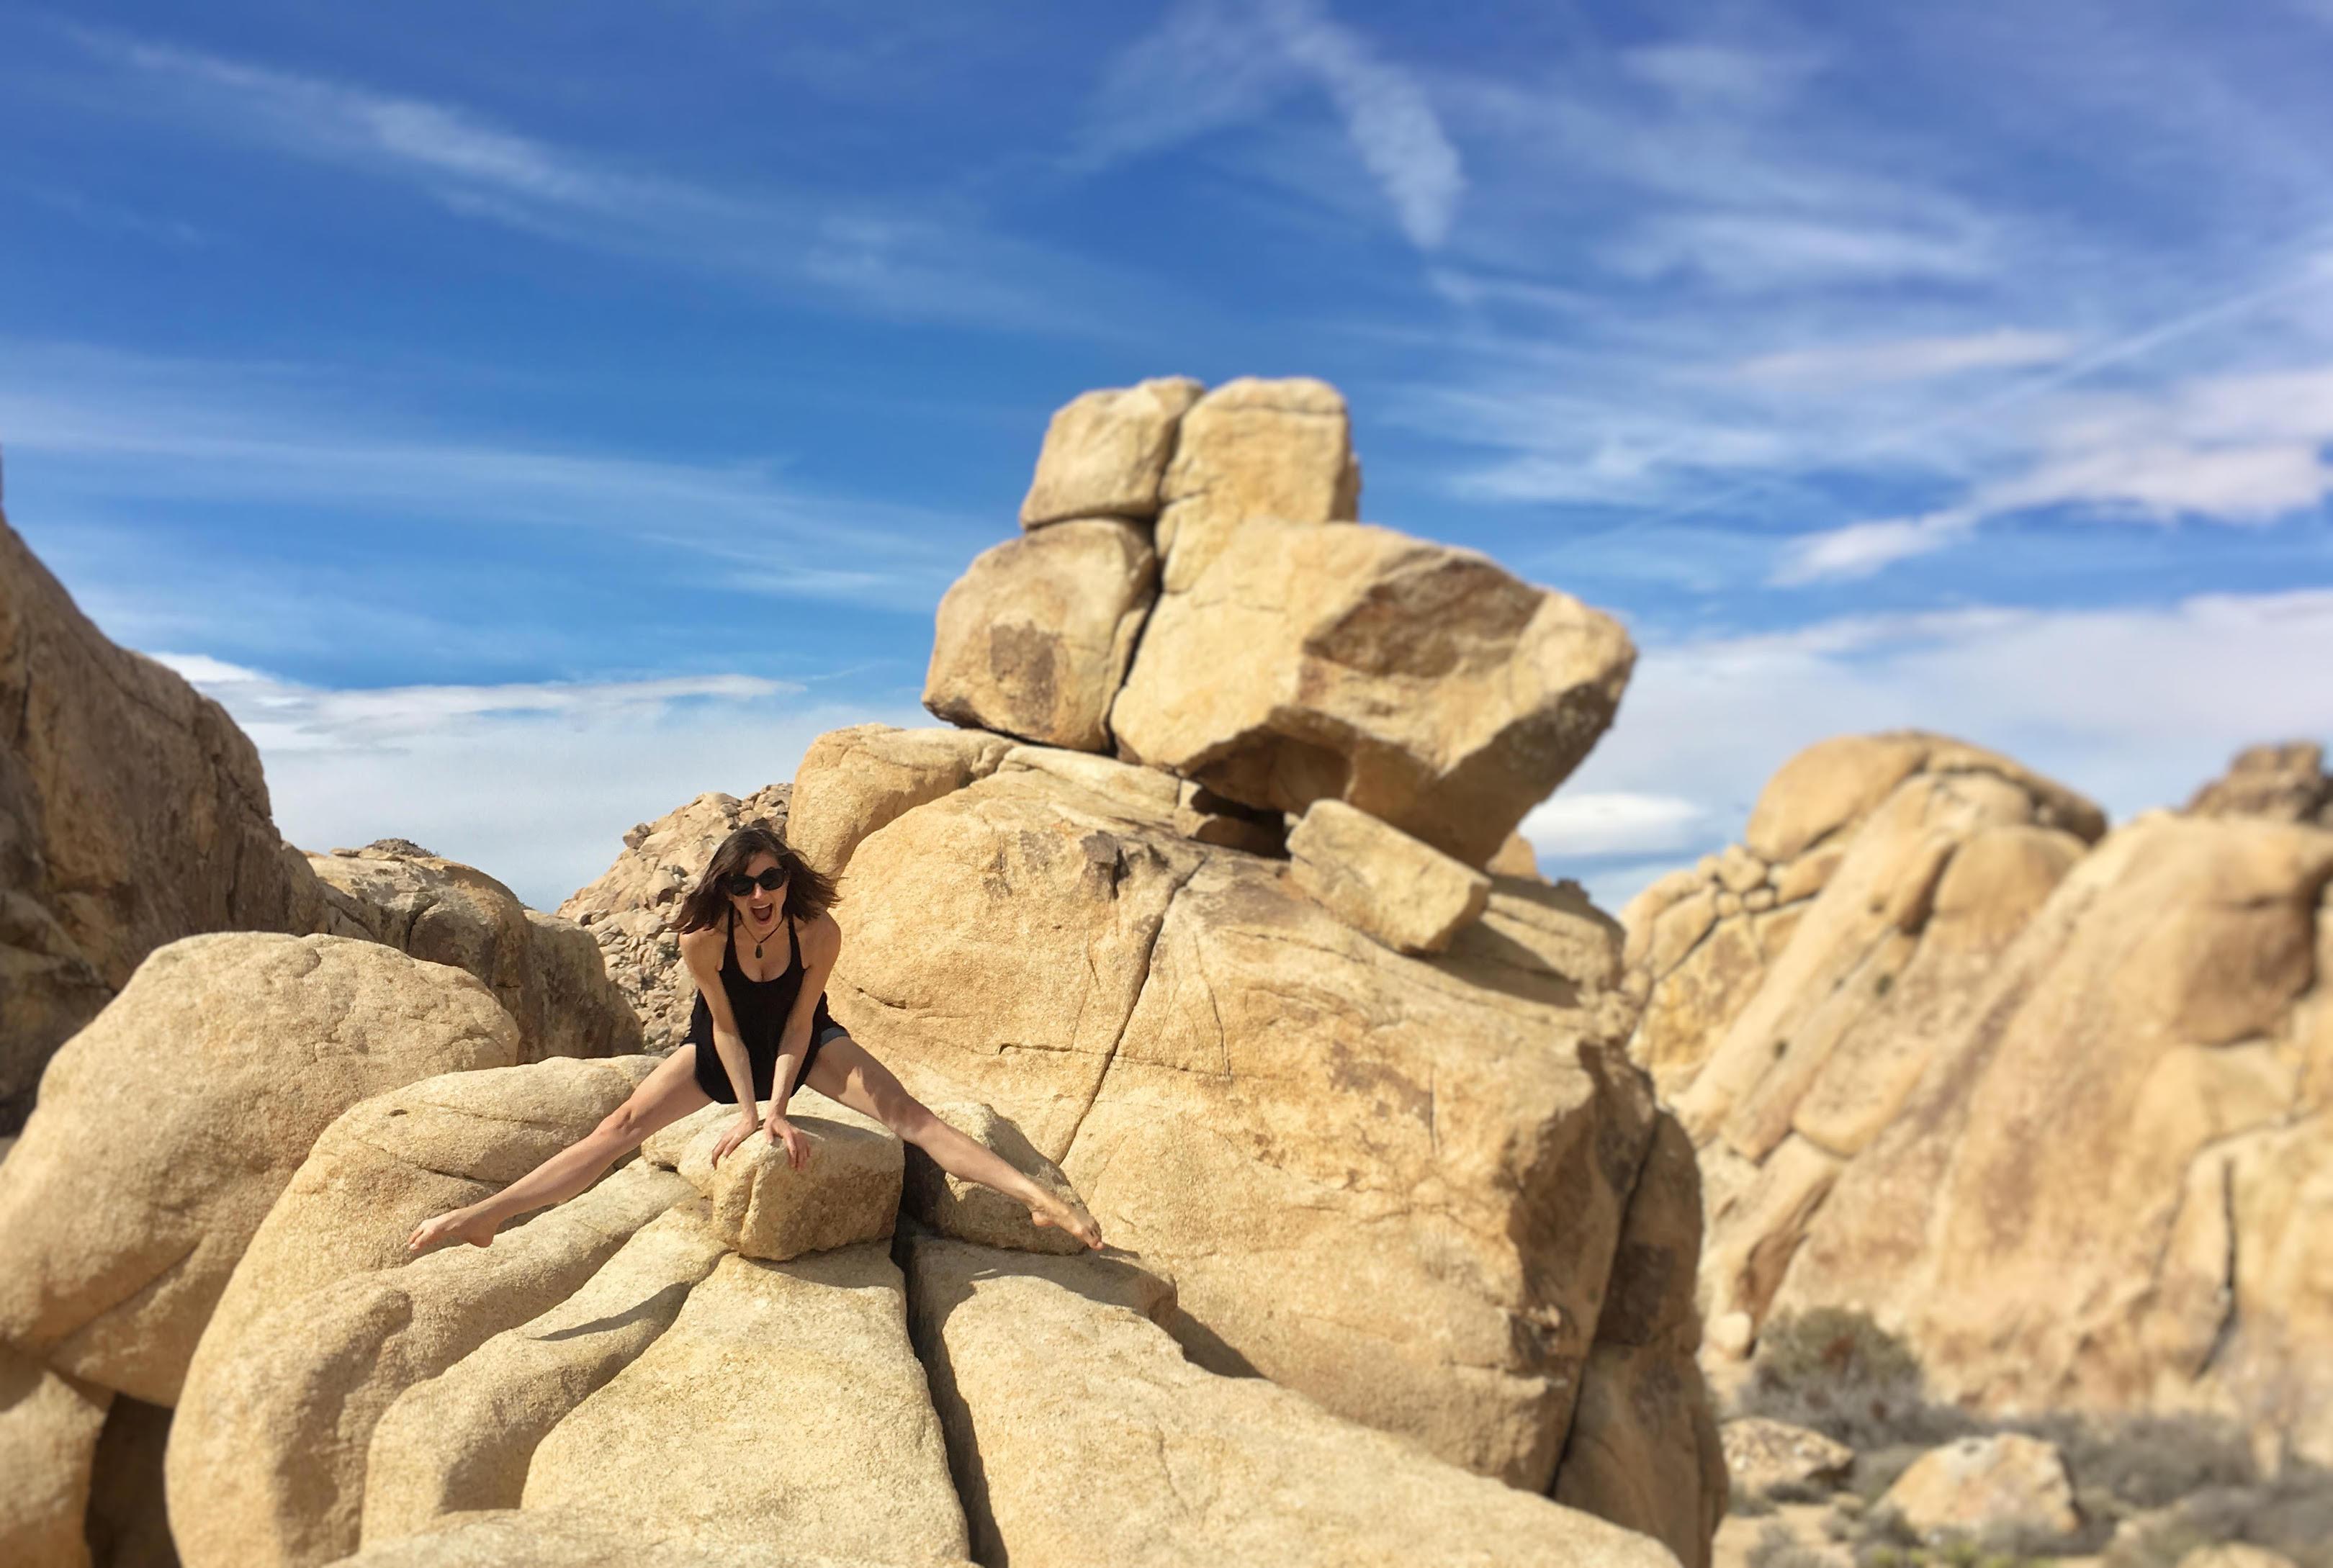 Living Her Adventure: Jess Southwick